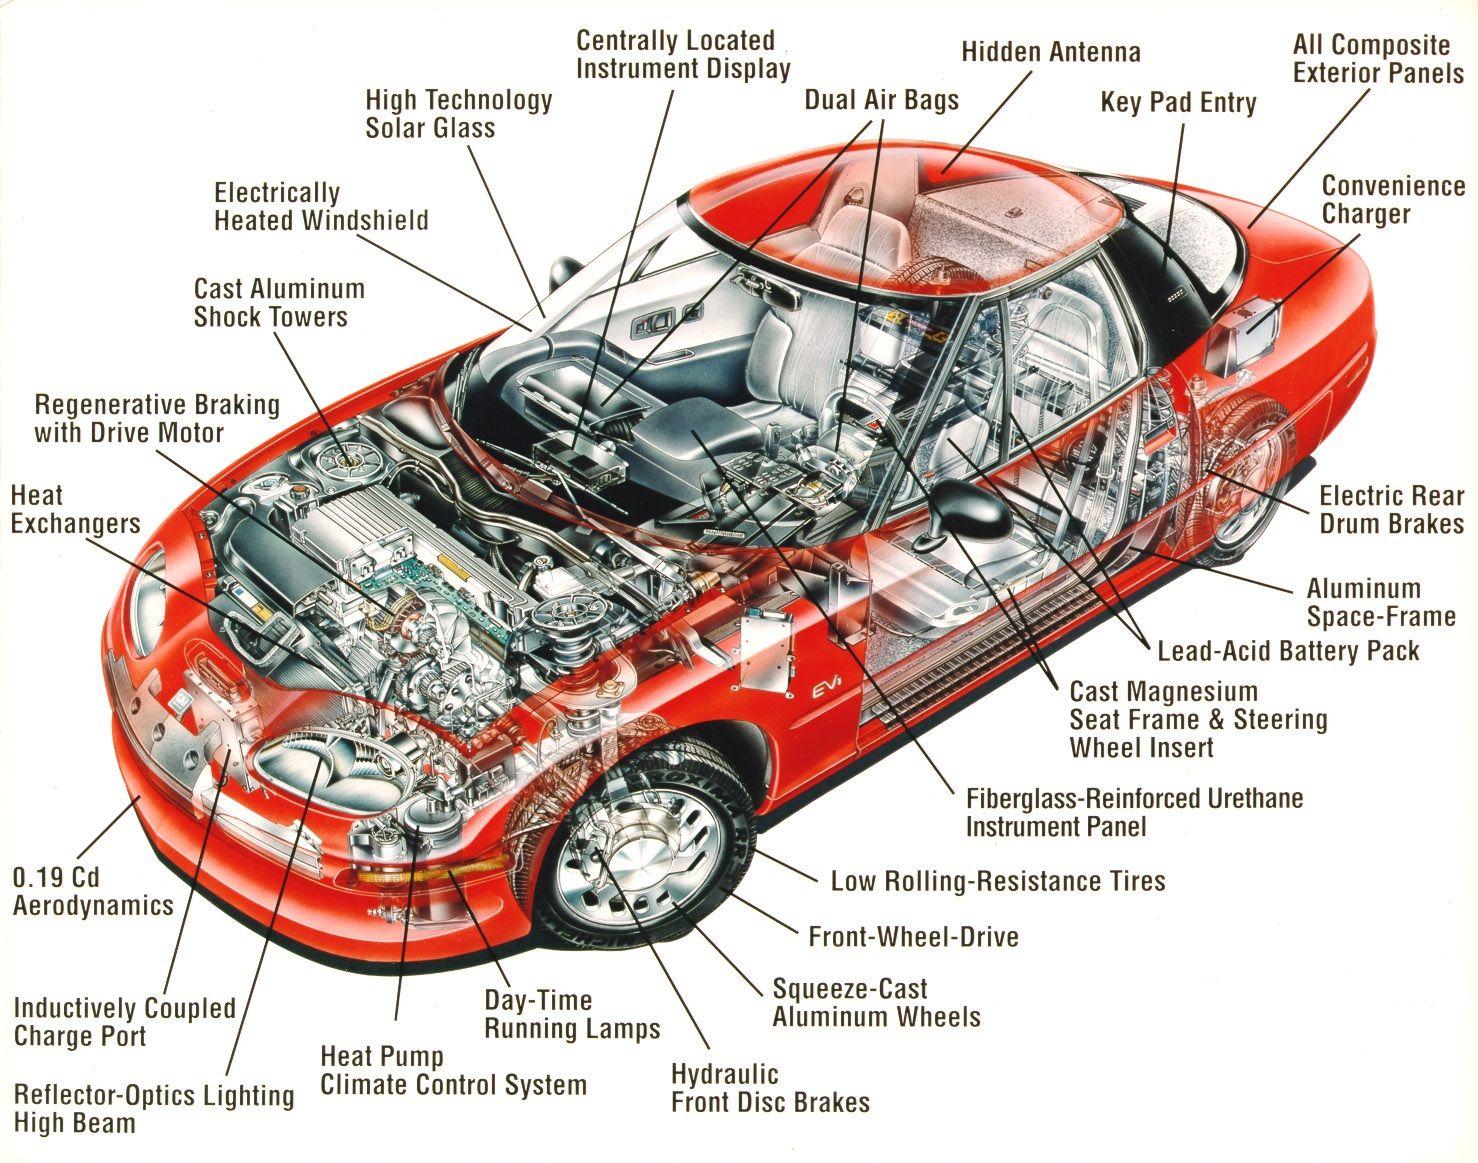 Pin By Yango Yango On Cars Car Spare Parts Car Engine Car Parts